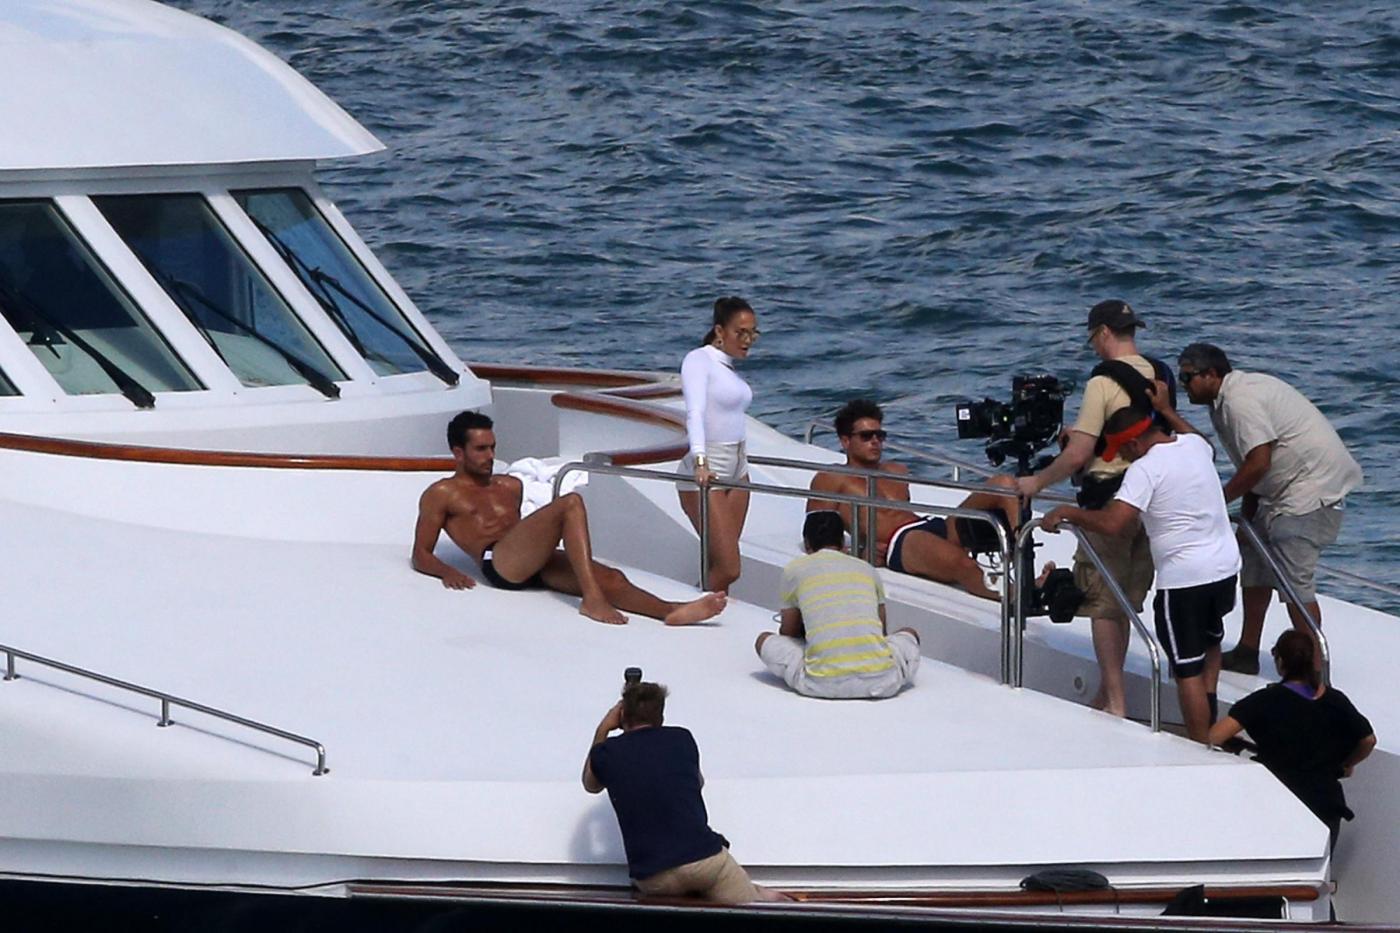 Jennifer Lopez Looks Sexy In White Hot Pants While Filming A Music Video In Miami Jennifer Lopez su uno yacht di lusso a Miami04